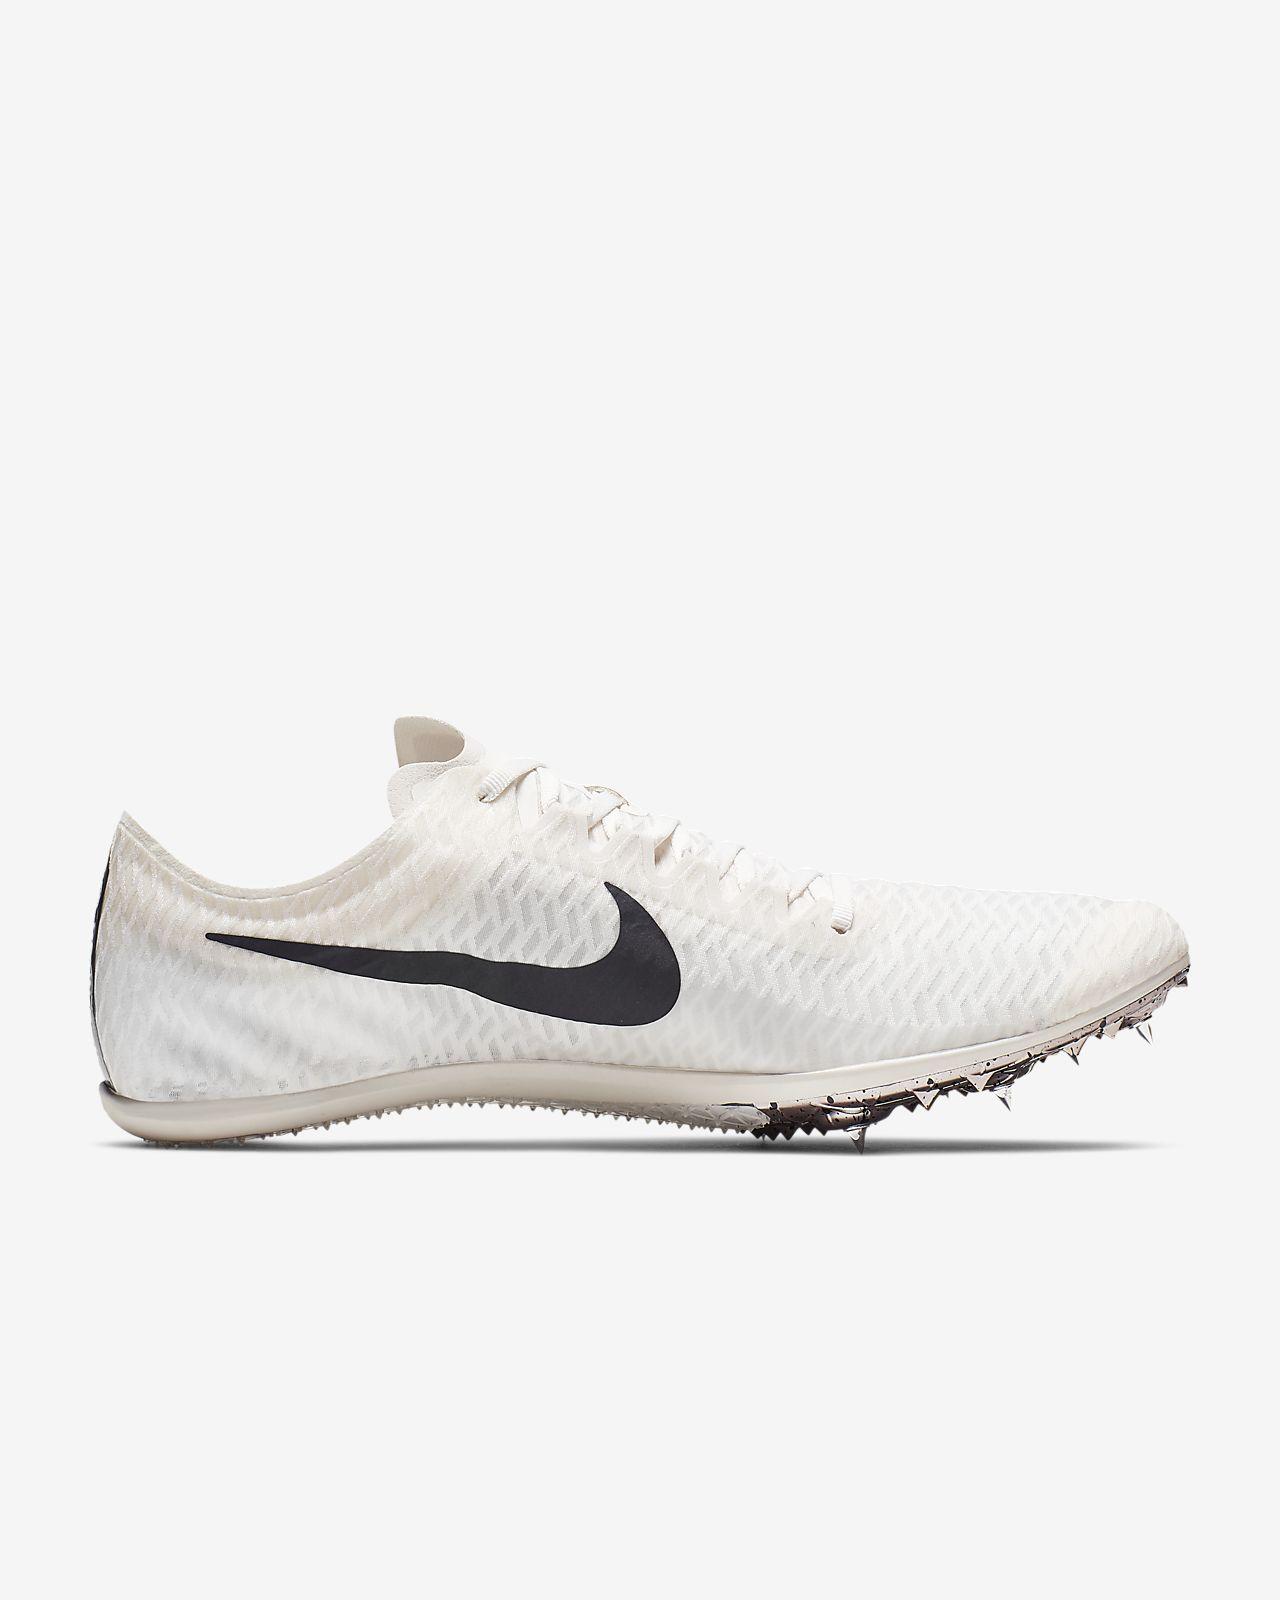 ec3444aeed6 Nike Zoom Mamba 5 Zapatillas de running. Nike.com ES